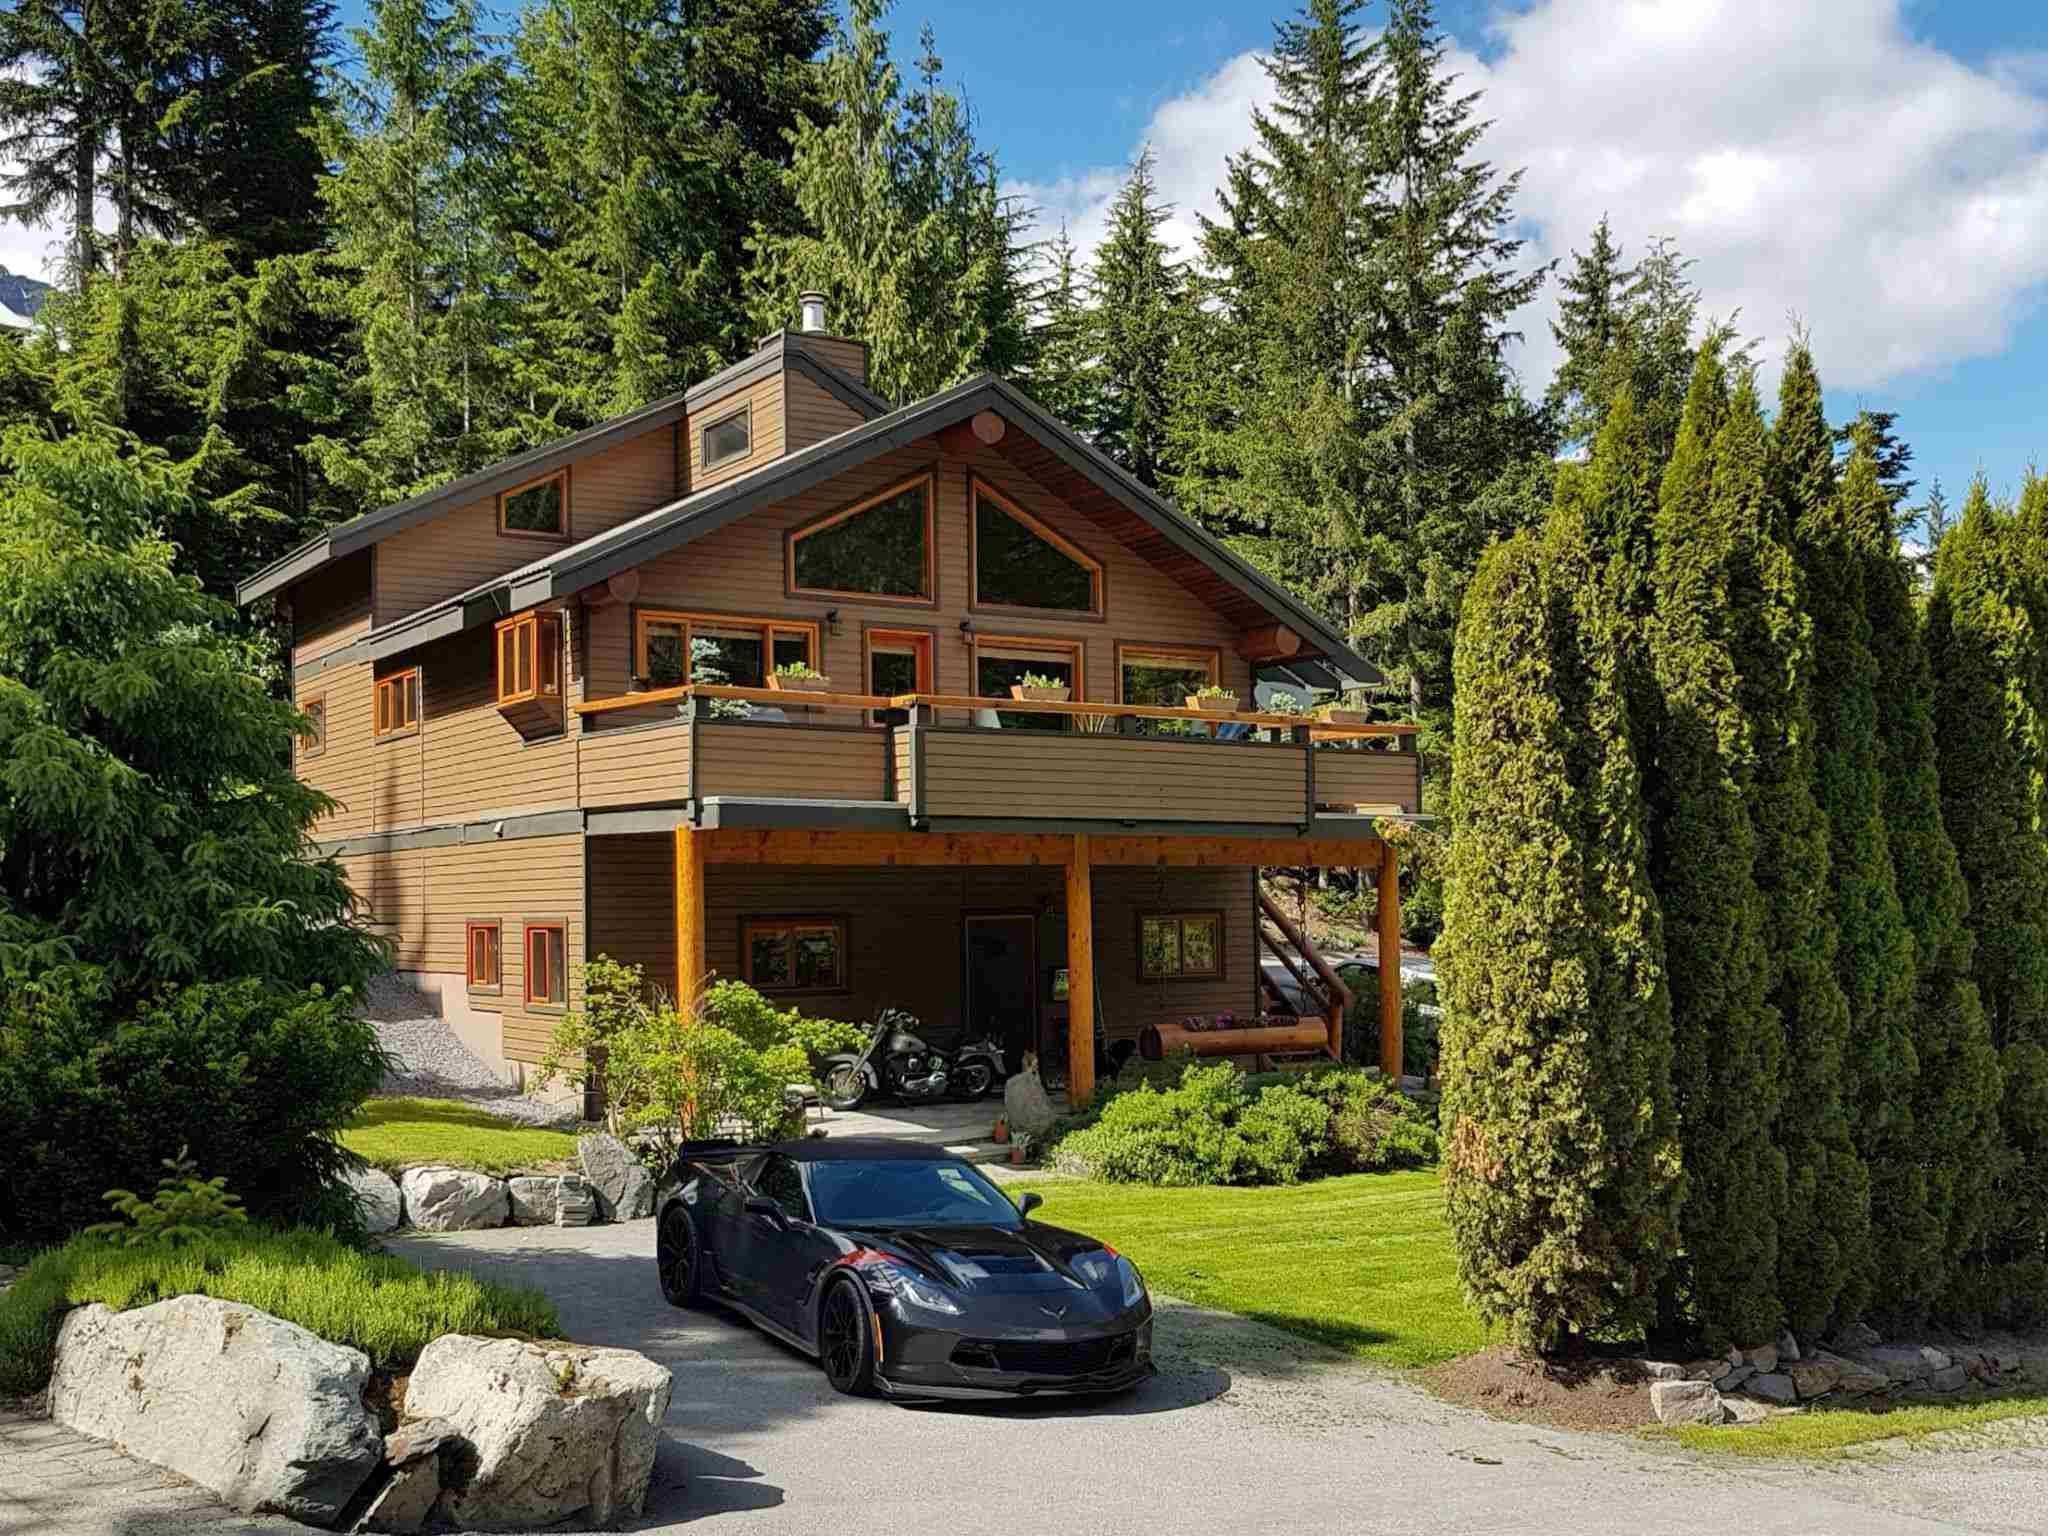 "Main Photo: 2347 CHEAKAMUS Way in Whistler: Bayshores House for sale in ""Bayshores"" : MLS®# R2595543"